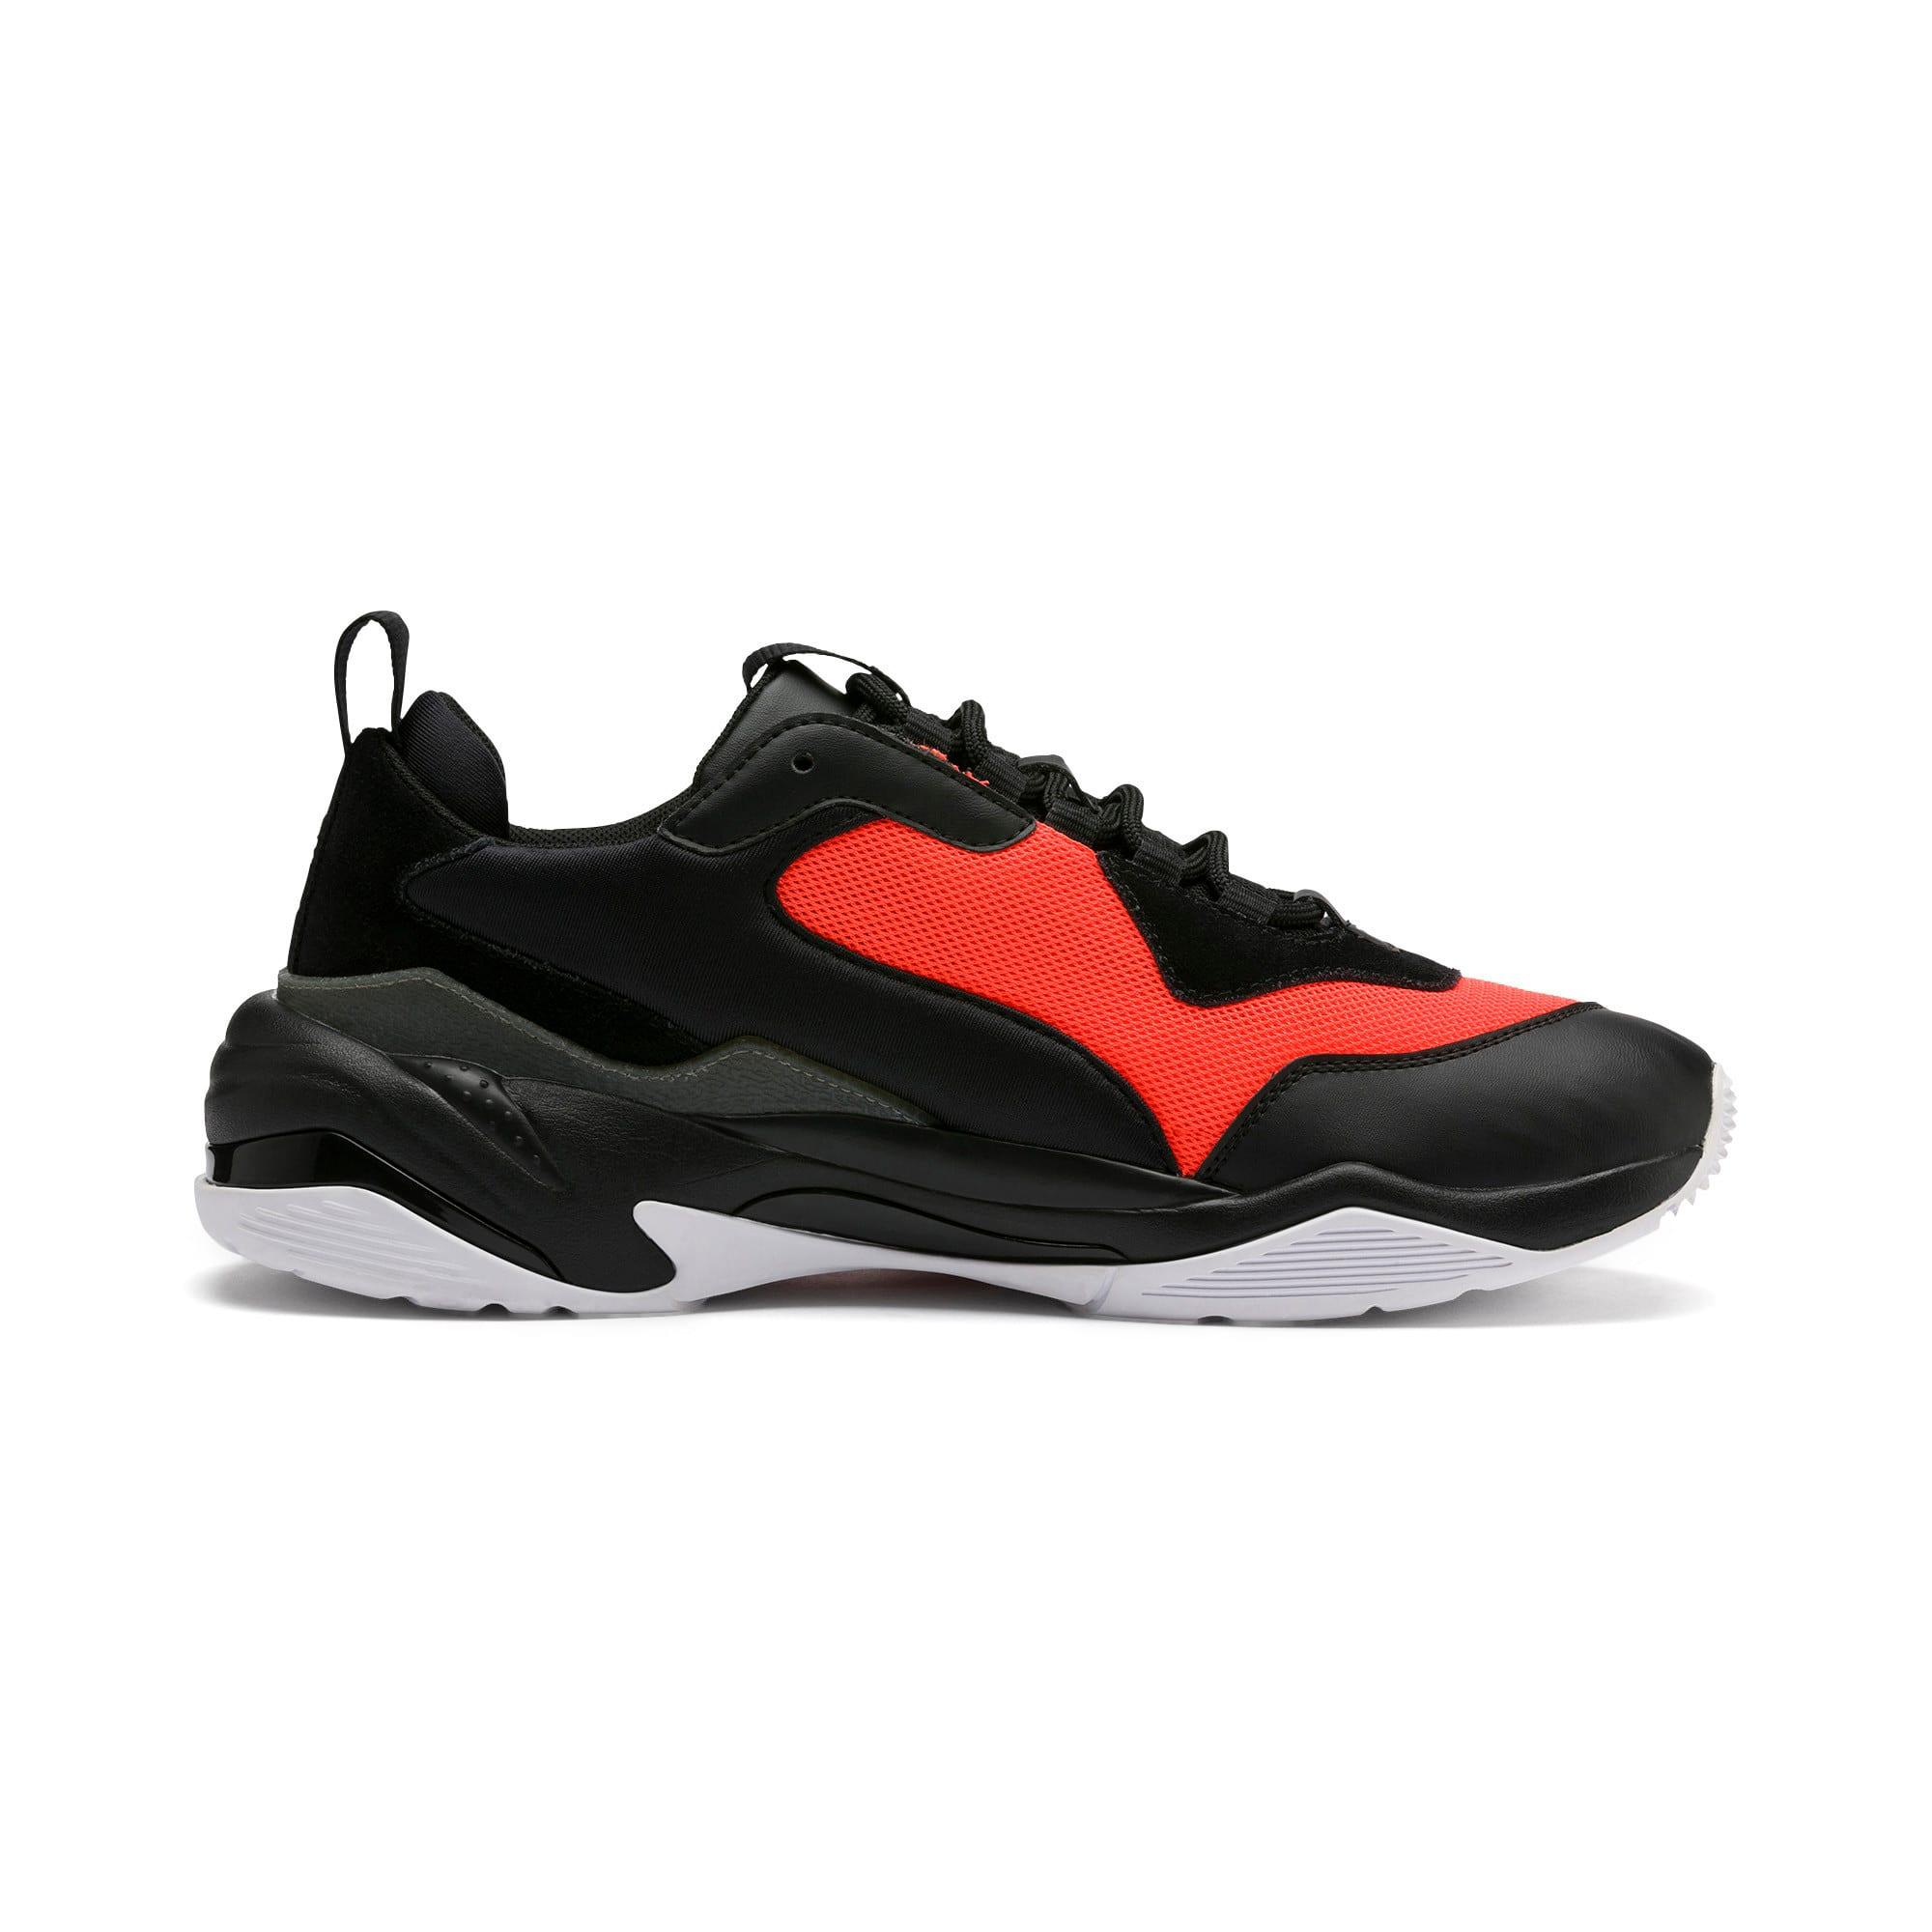 Thumbnail 6 of Thunder Fashion 2.0 sportschoenen, Puma Black-Nrgy Red, medium